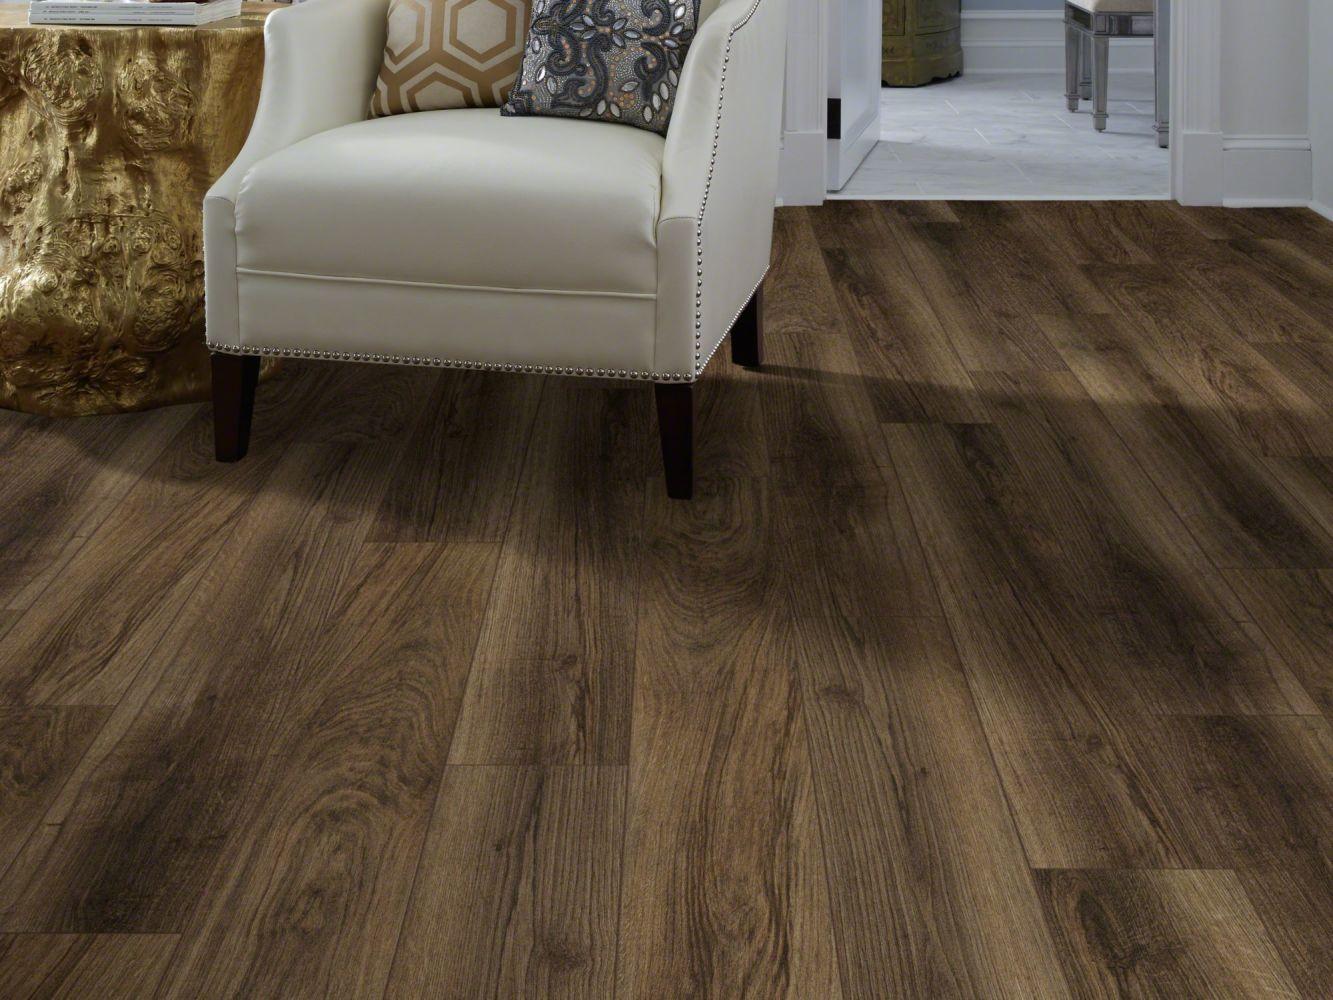 Shaw Floors Resilient Residential Tivoli Plus Cocco 00758_0845V